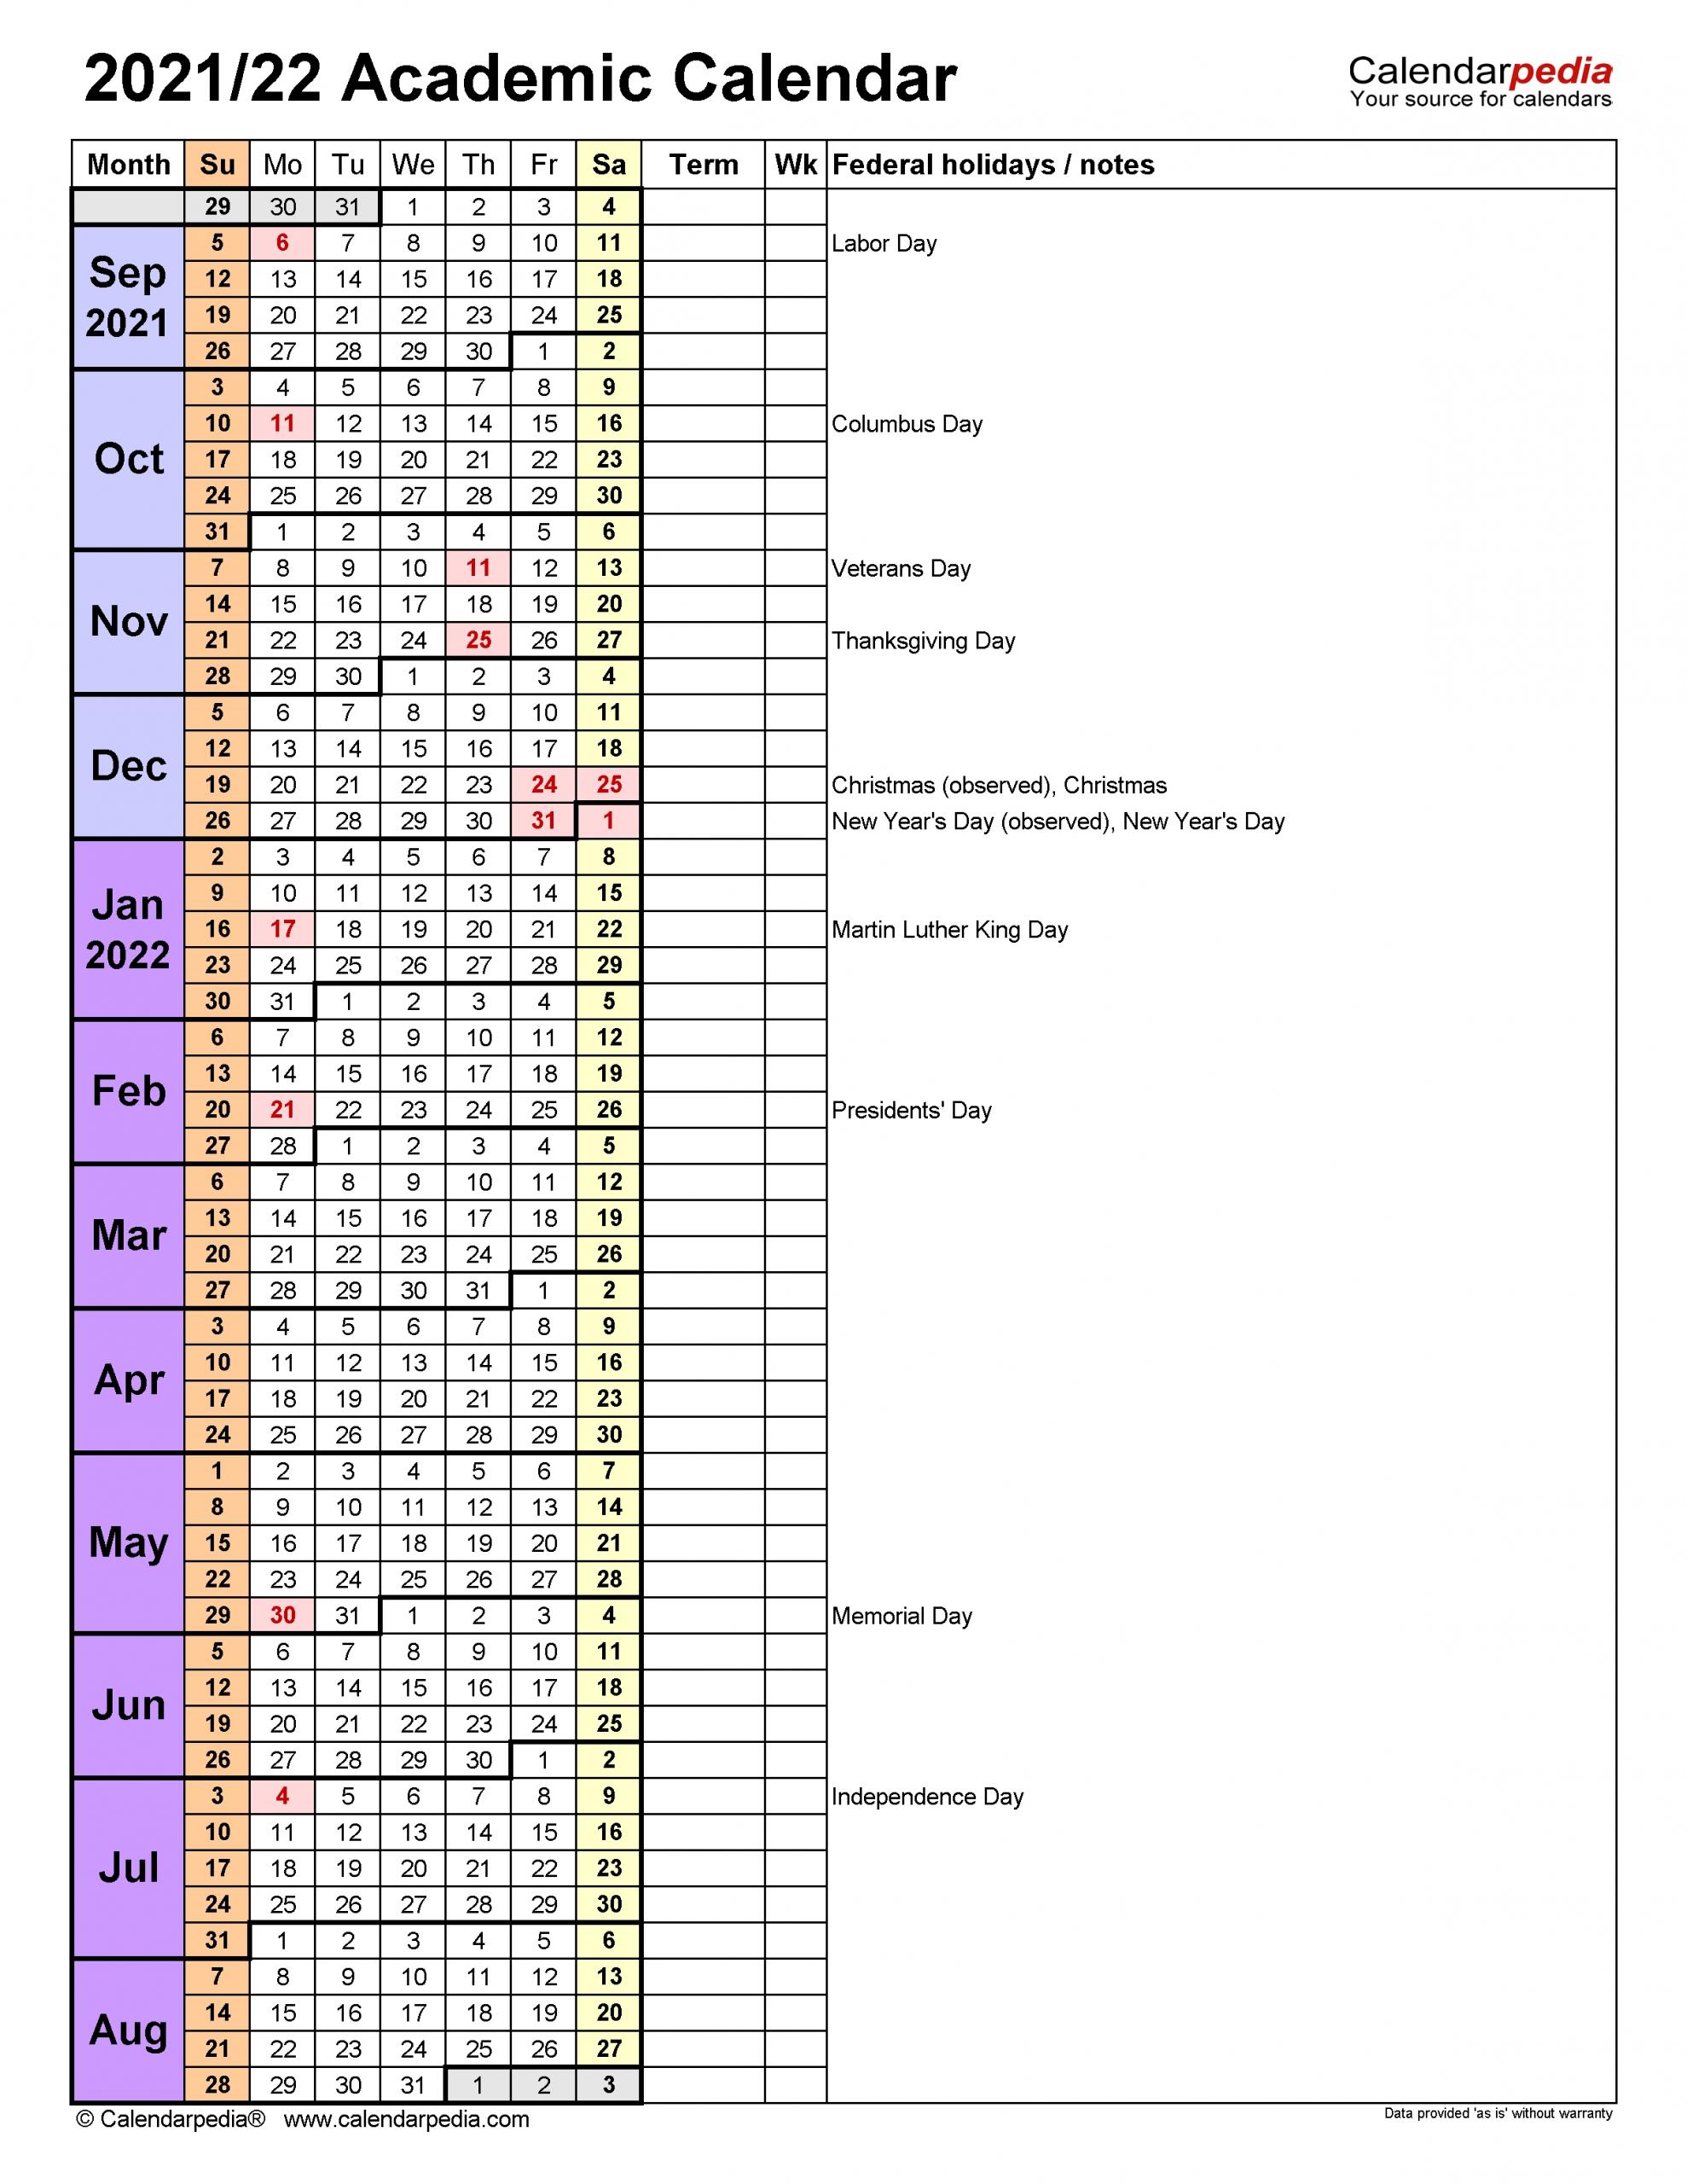 Calendar Wizard 2021 Free Calendar Wizard Word 2021 | Free calendar, Calendar, Calendar